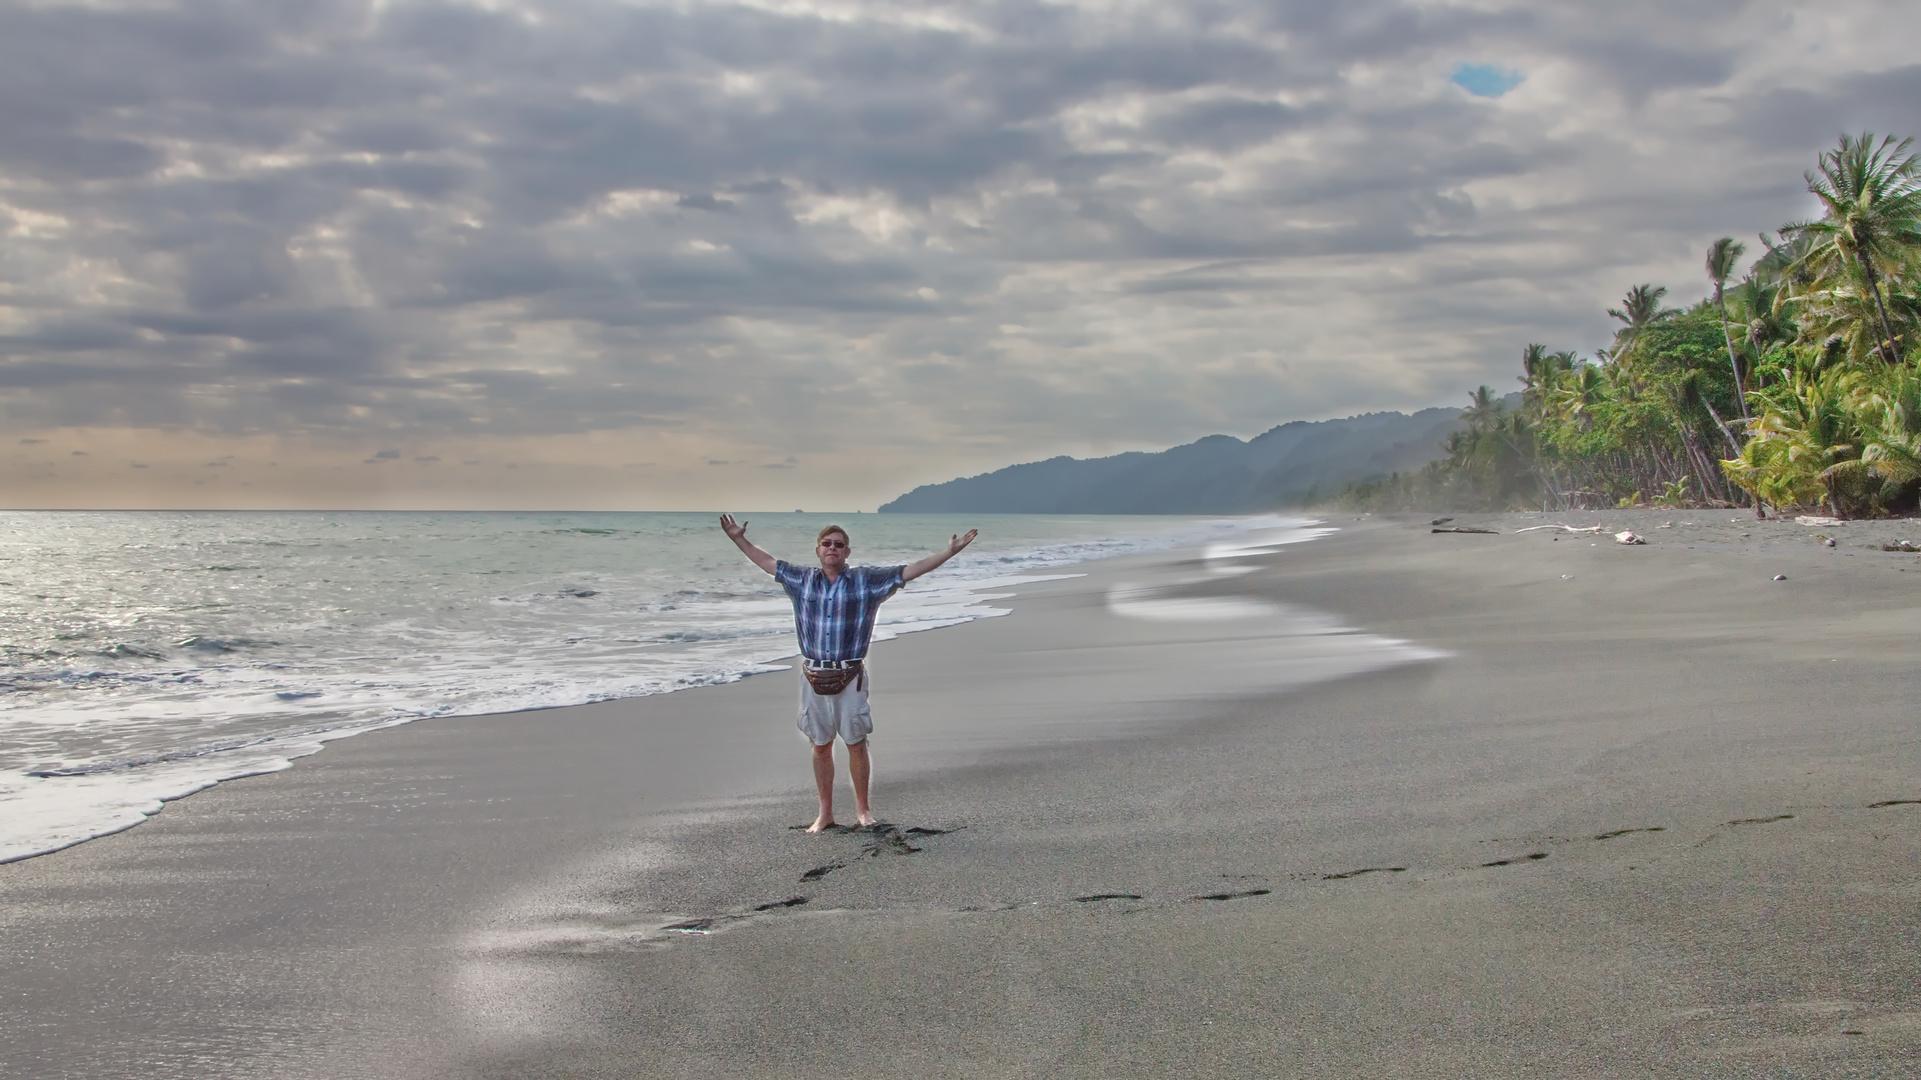 Peninsula de Osa, Carate, Costa Rica